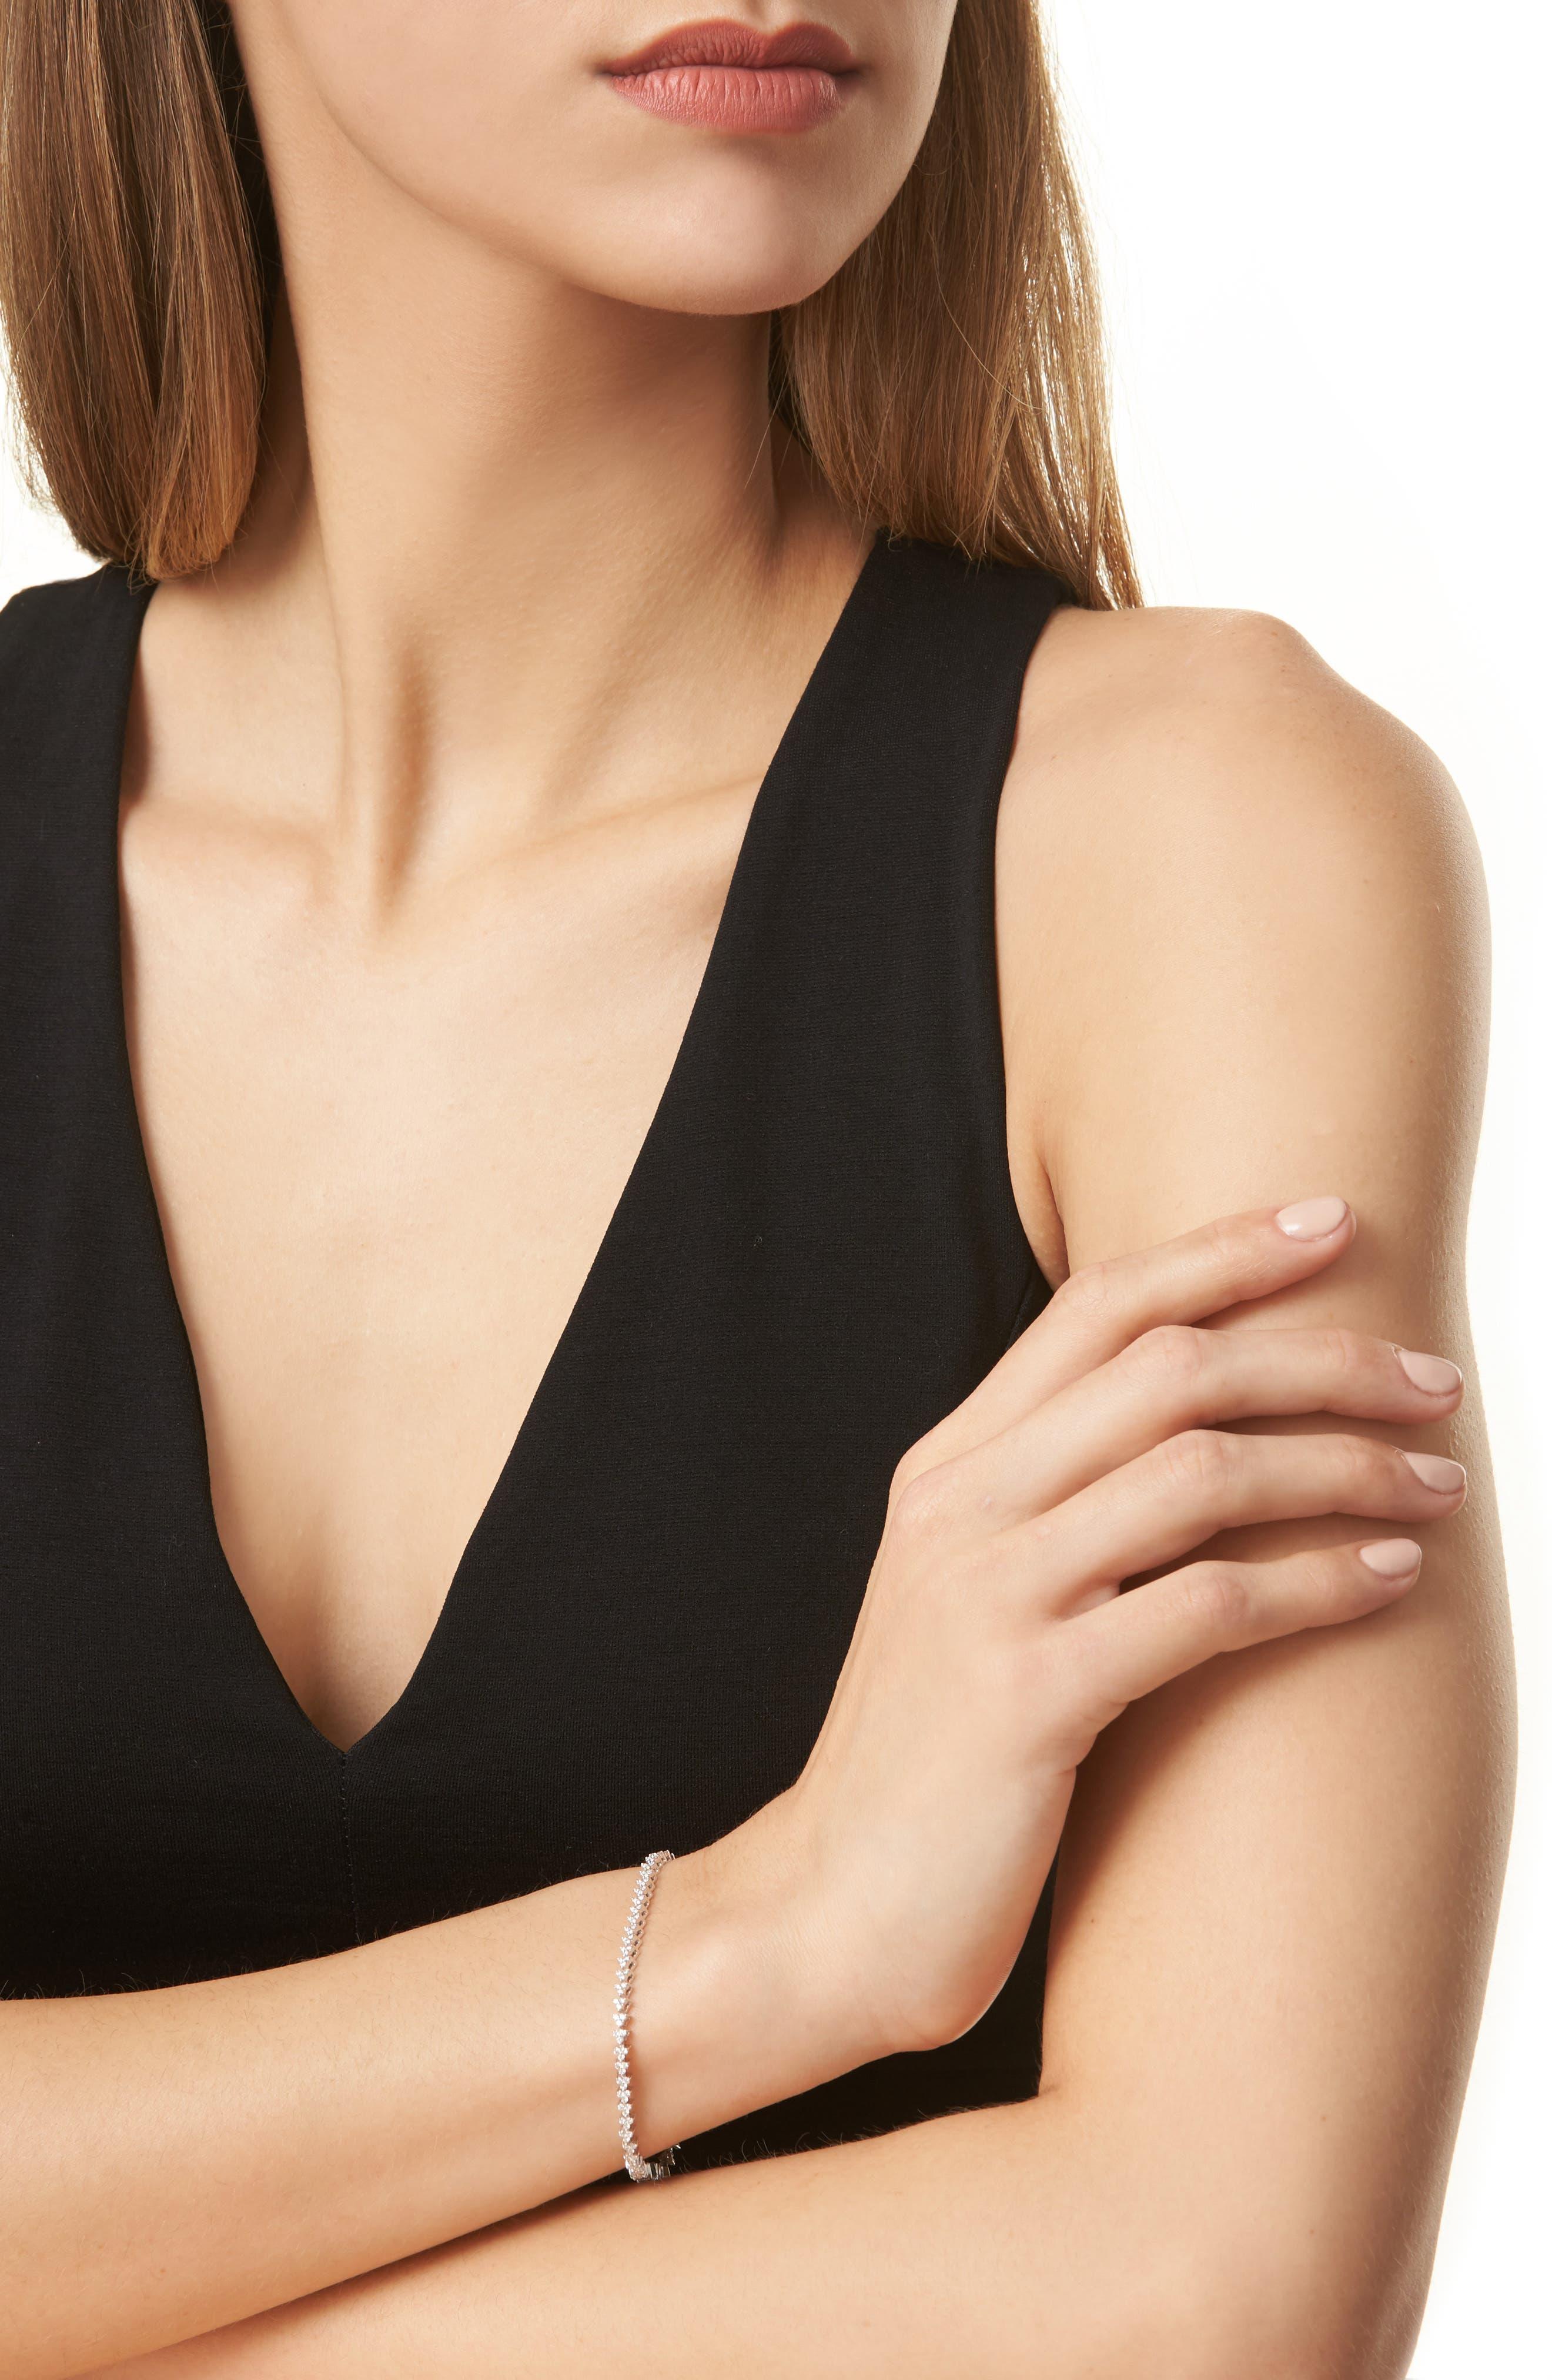 Liora Diamond Tennis Bracelet,                             Alternate thumbnail 2, color,                             WHITE GOLD